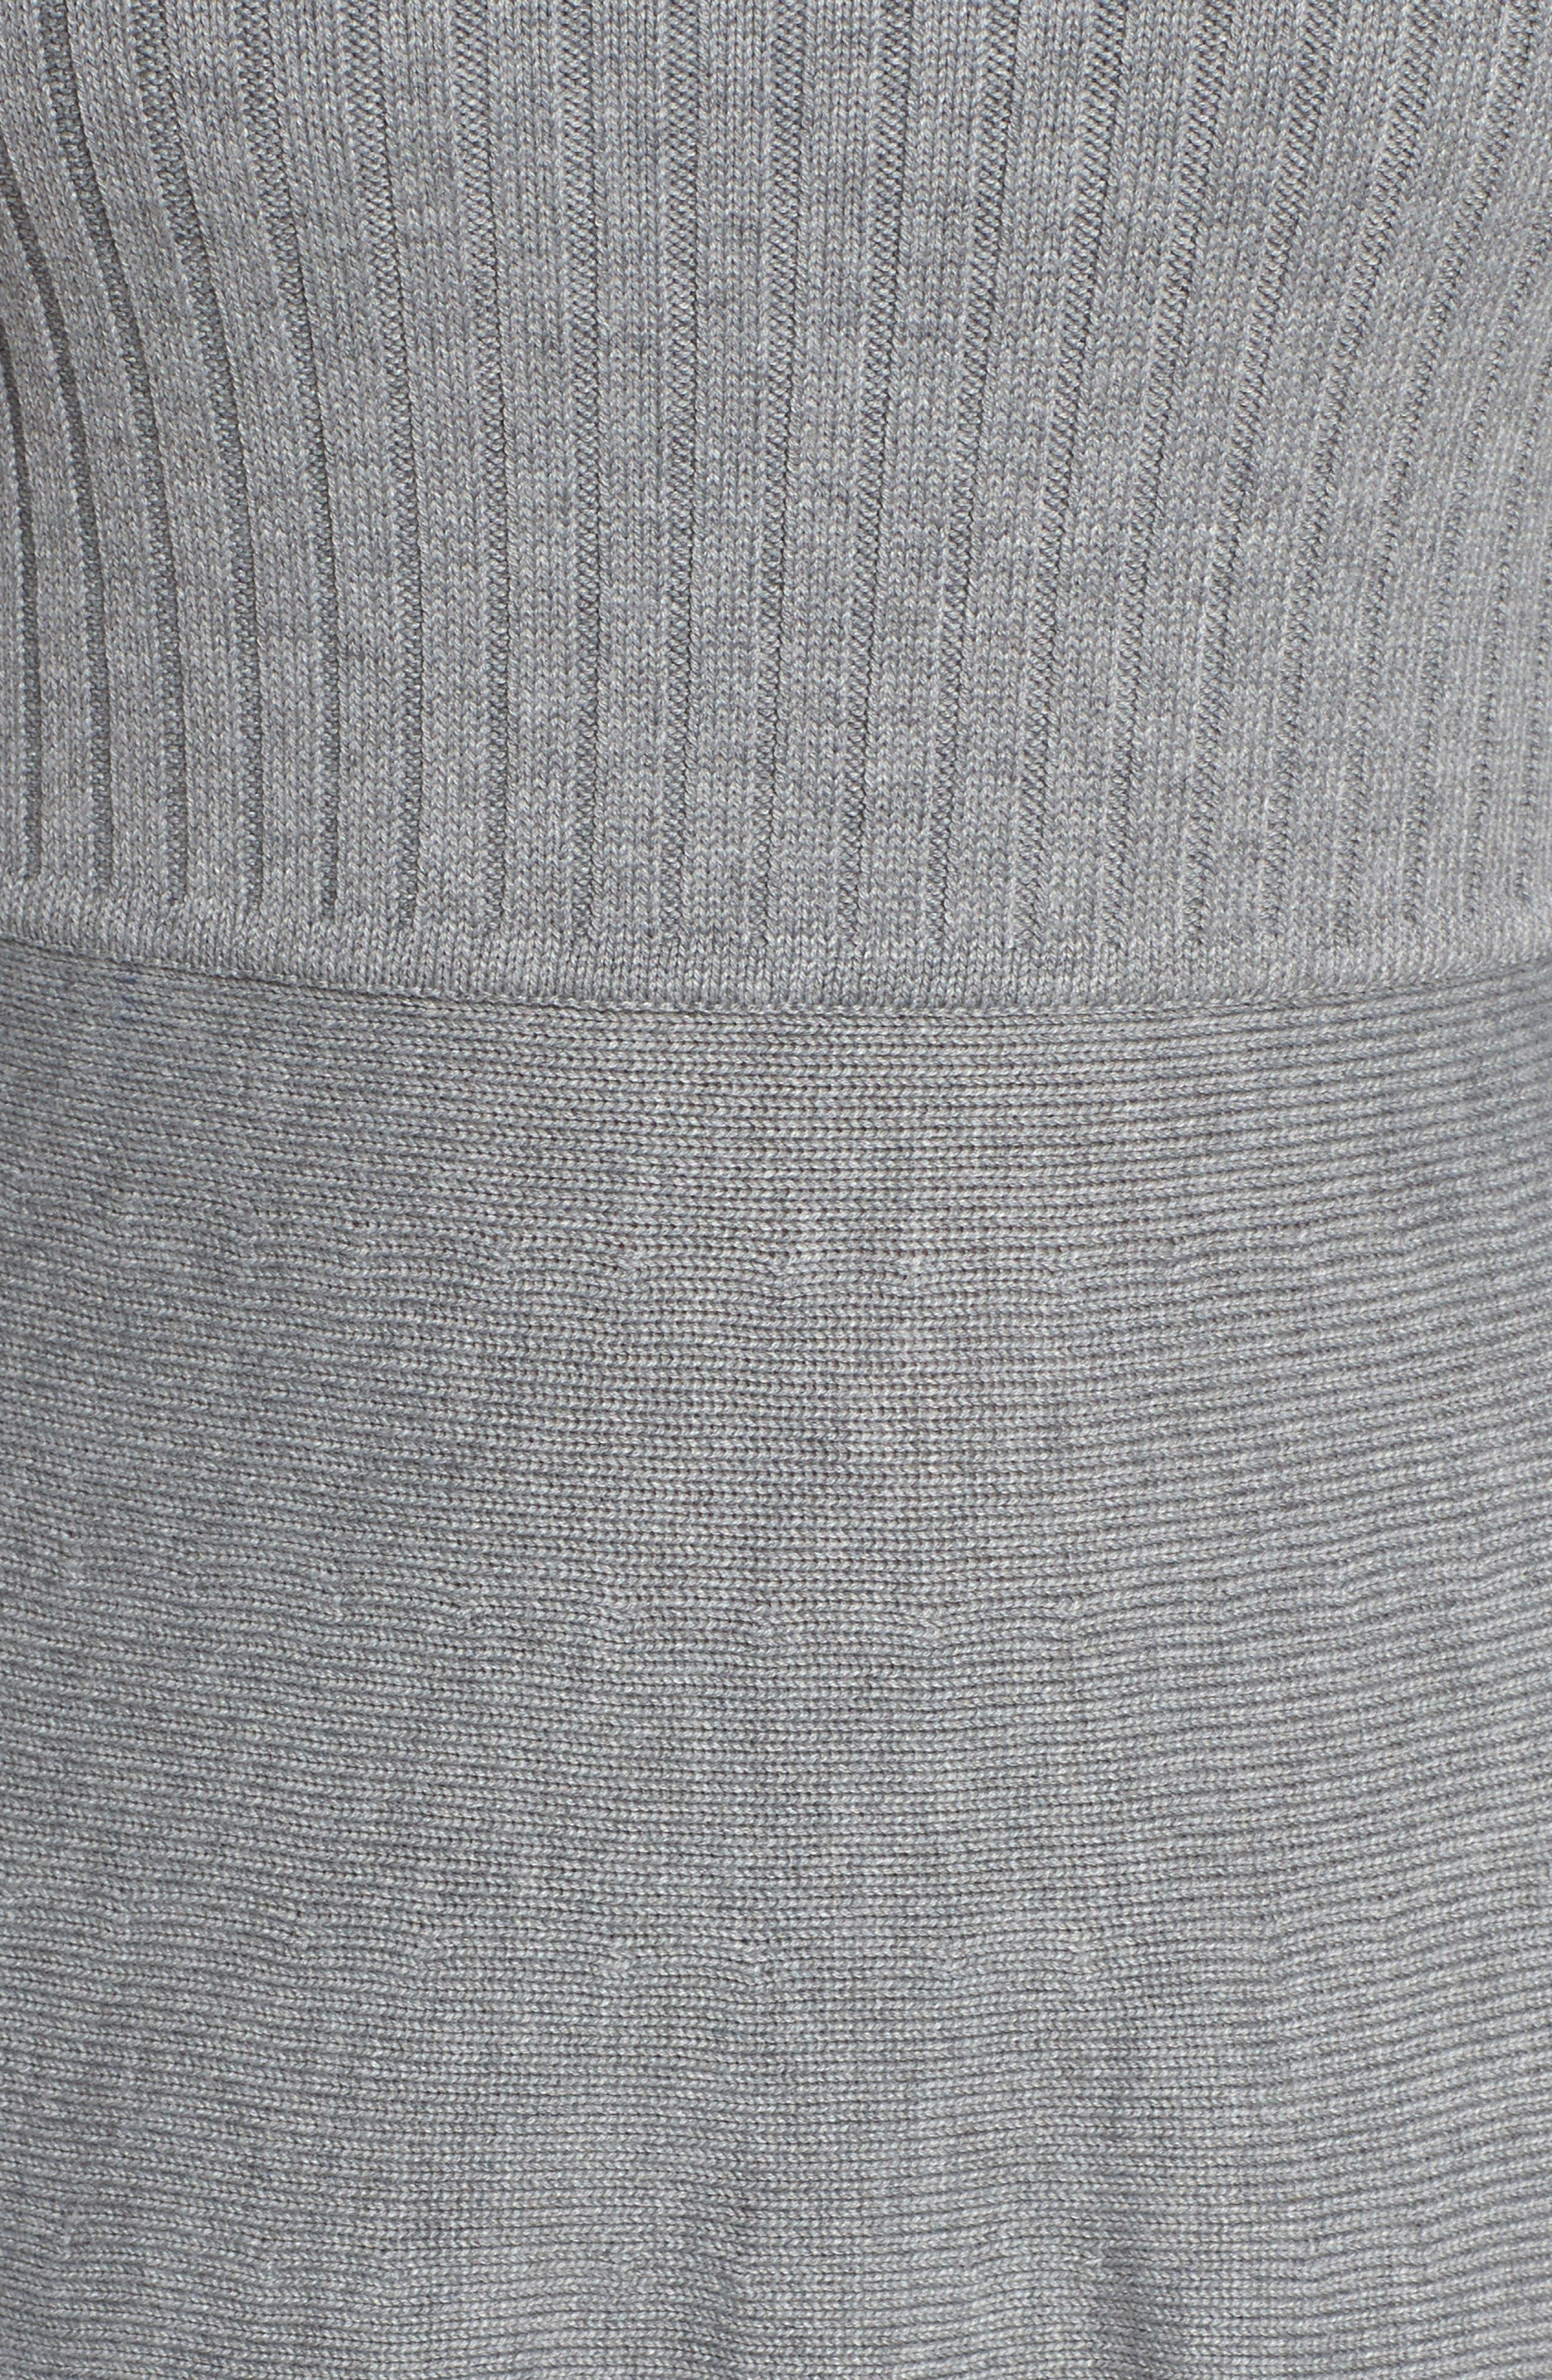 Turtleneck Sweater Dress,                             Alternate thumbnail 7, color,                             GREY